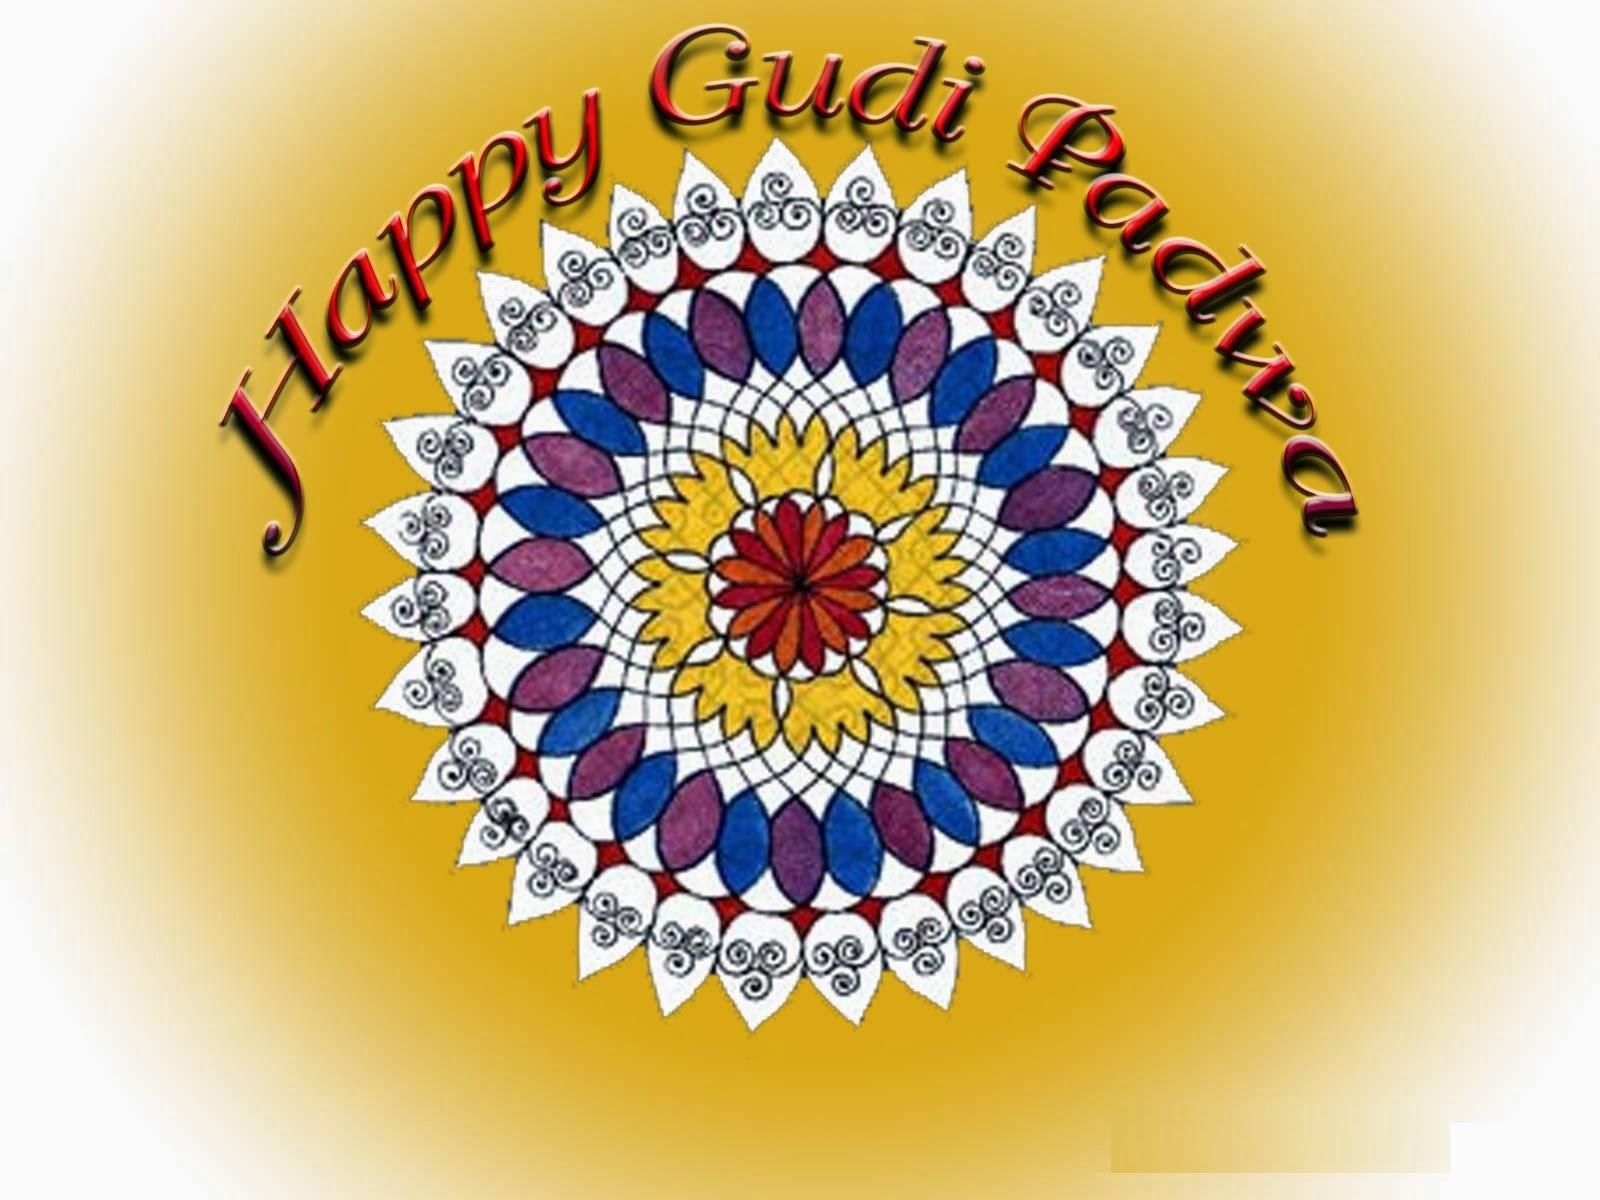 Gudi Padwa 2014 Images attractive one